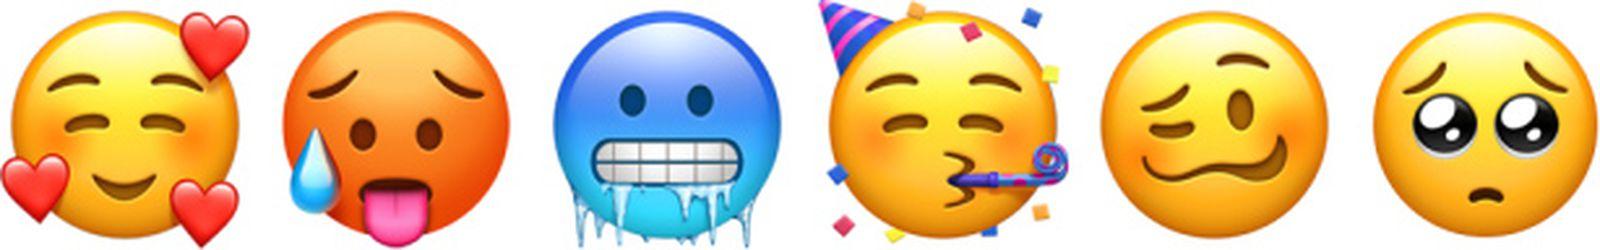 Roblox Addon Emojis How To Use Emoji On Mac Macrumors